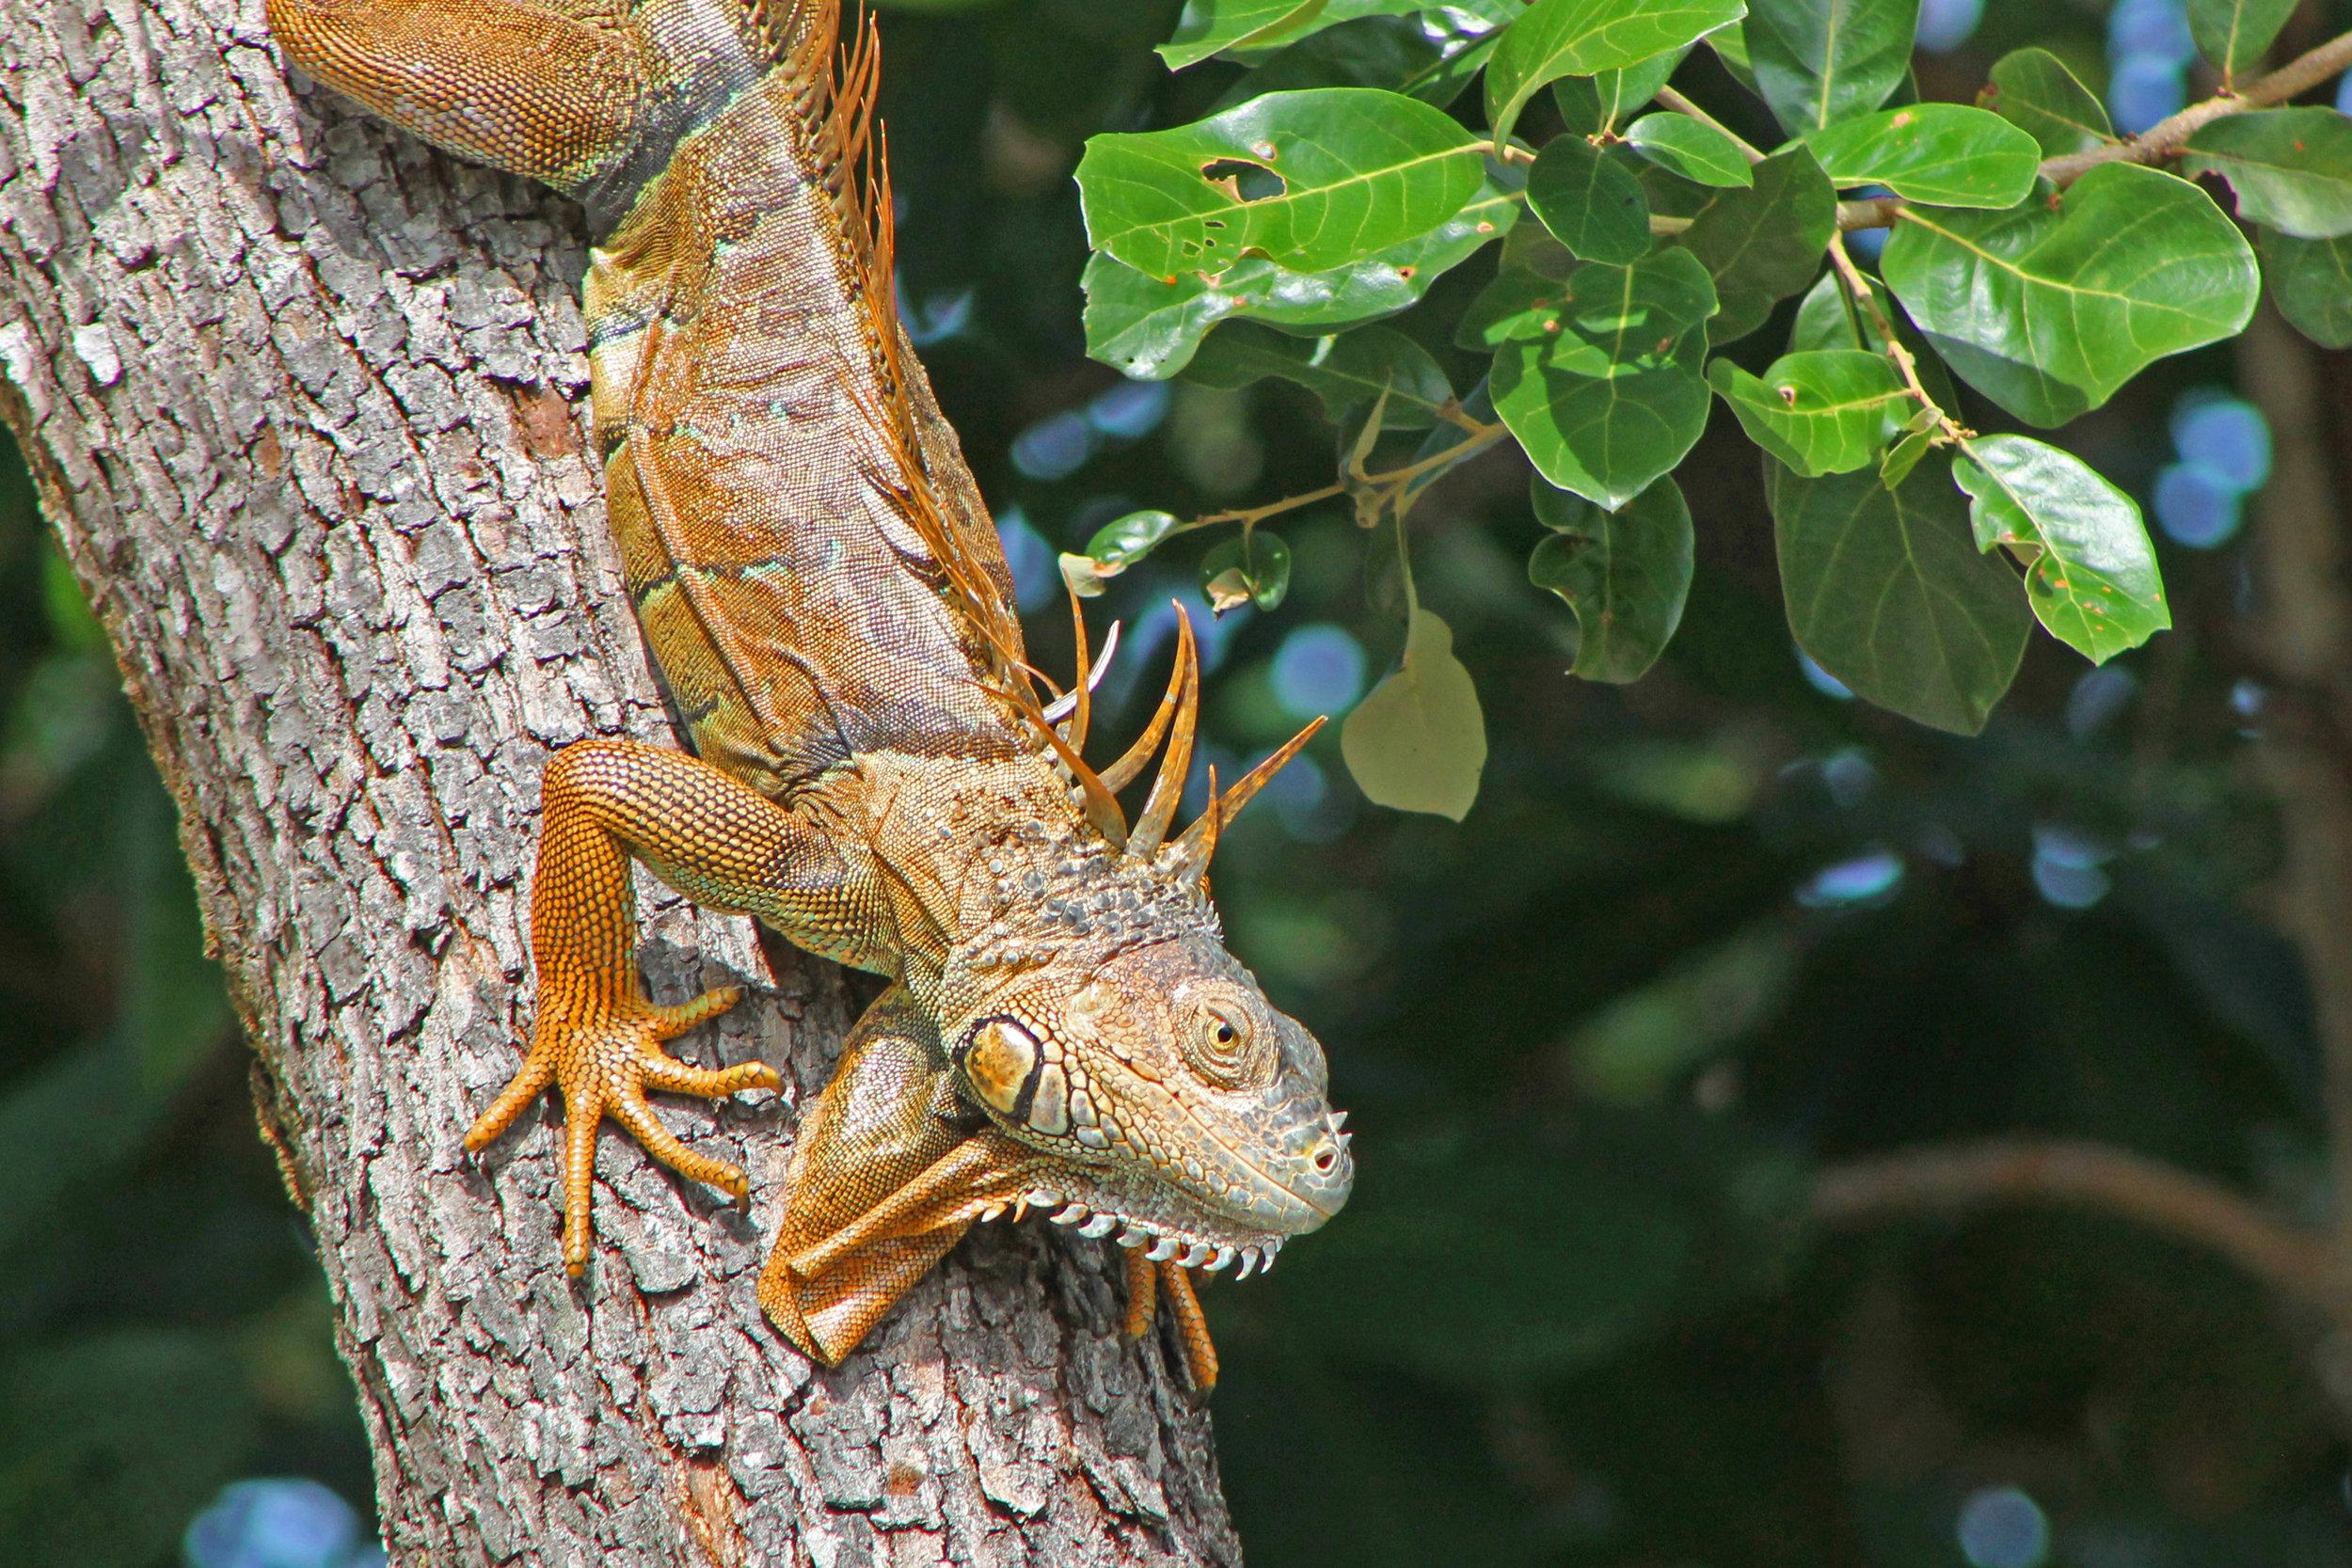 a_orange iguana jan 6 2018.jpg